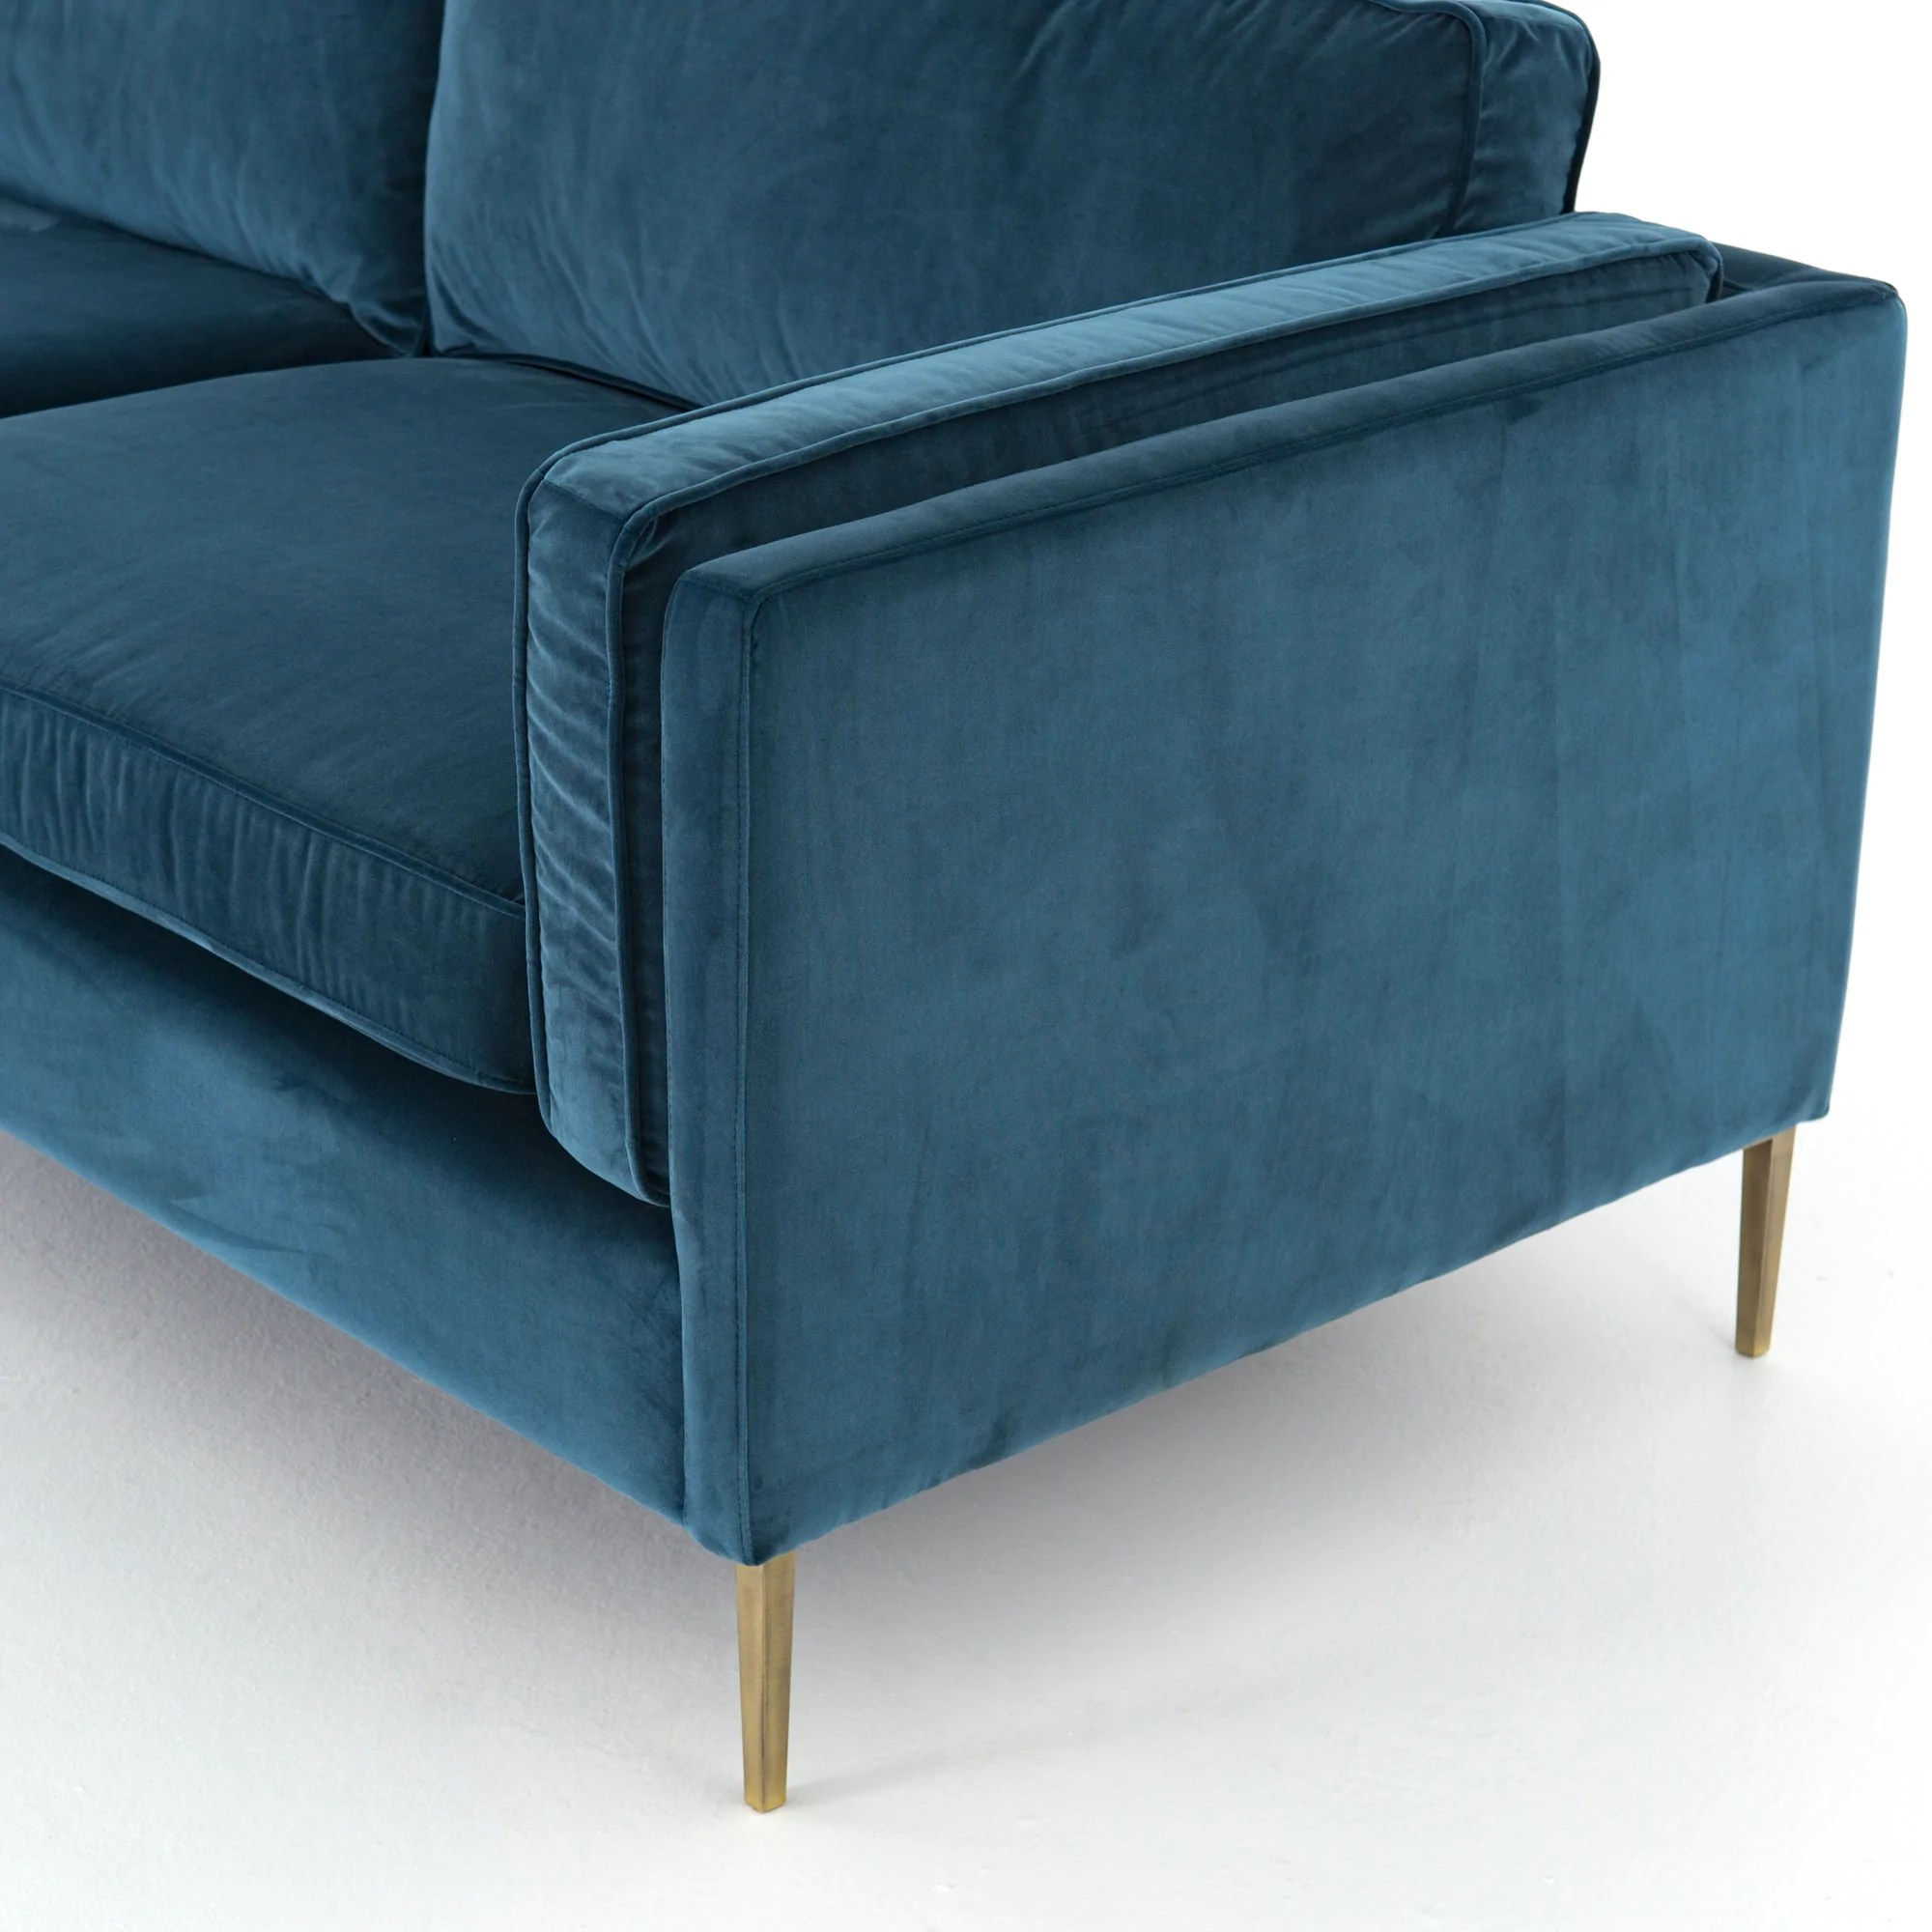 sabrina sofa sofas under 500 pounds sapphire sovo furniture